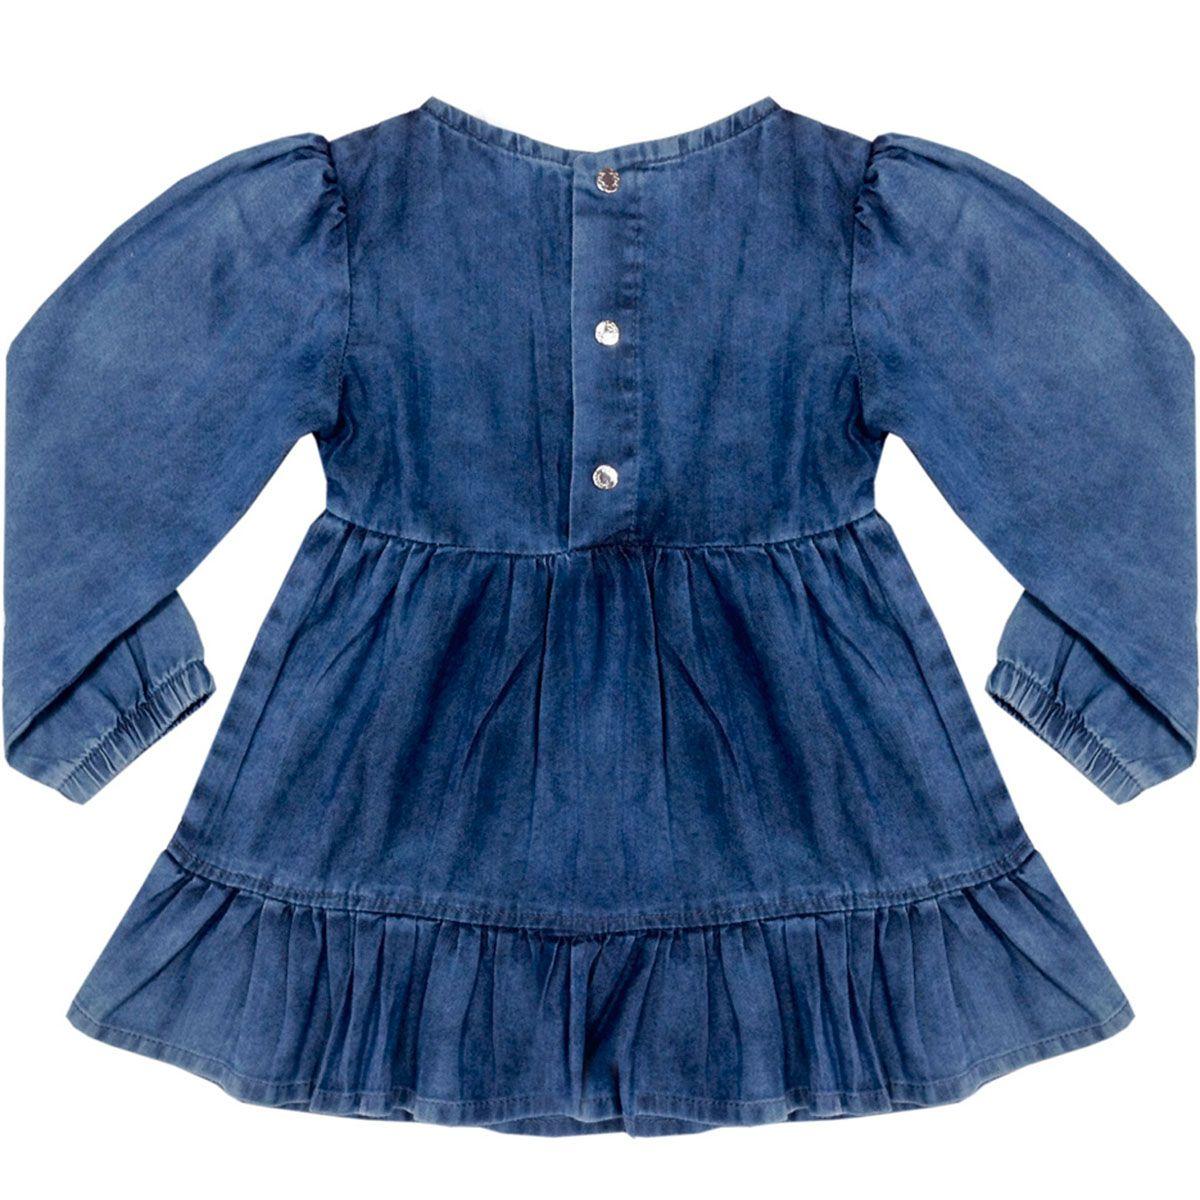 Vestido Look Jeans Feminino Azul